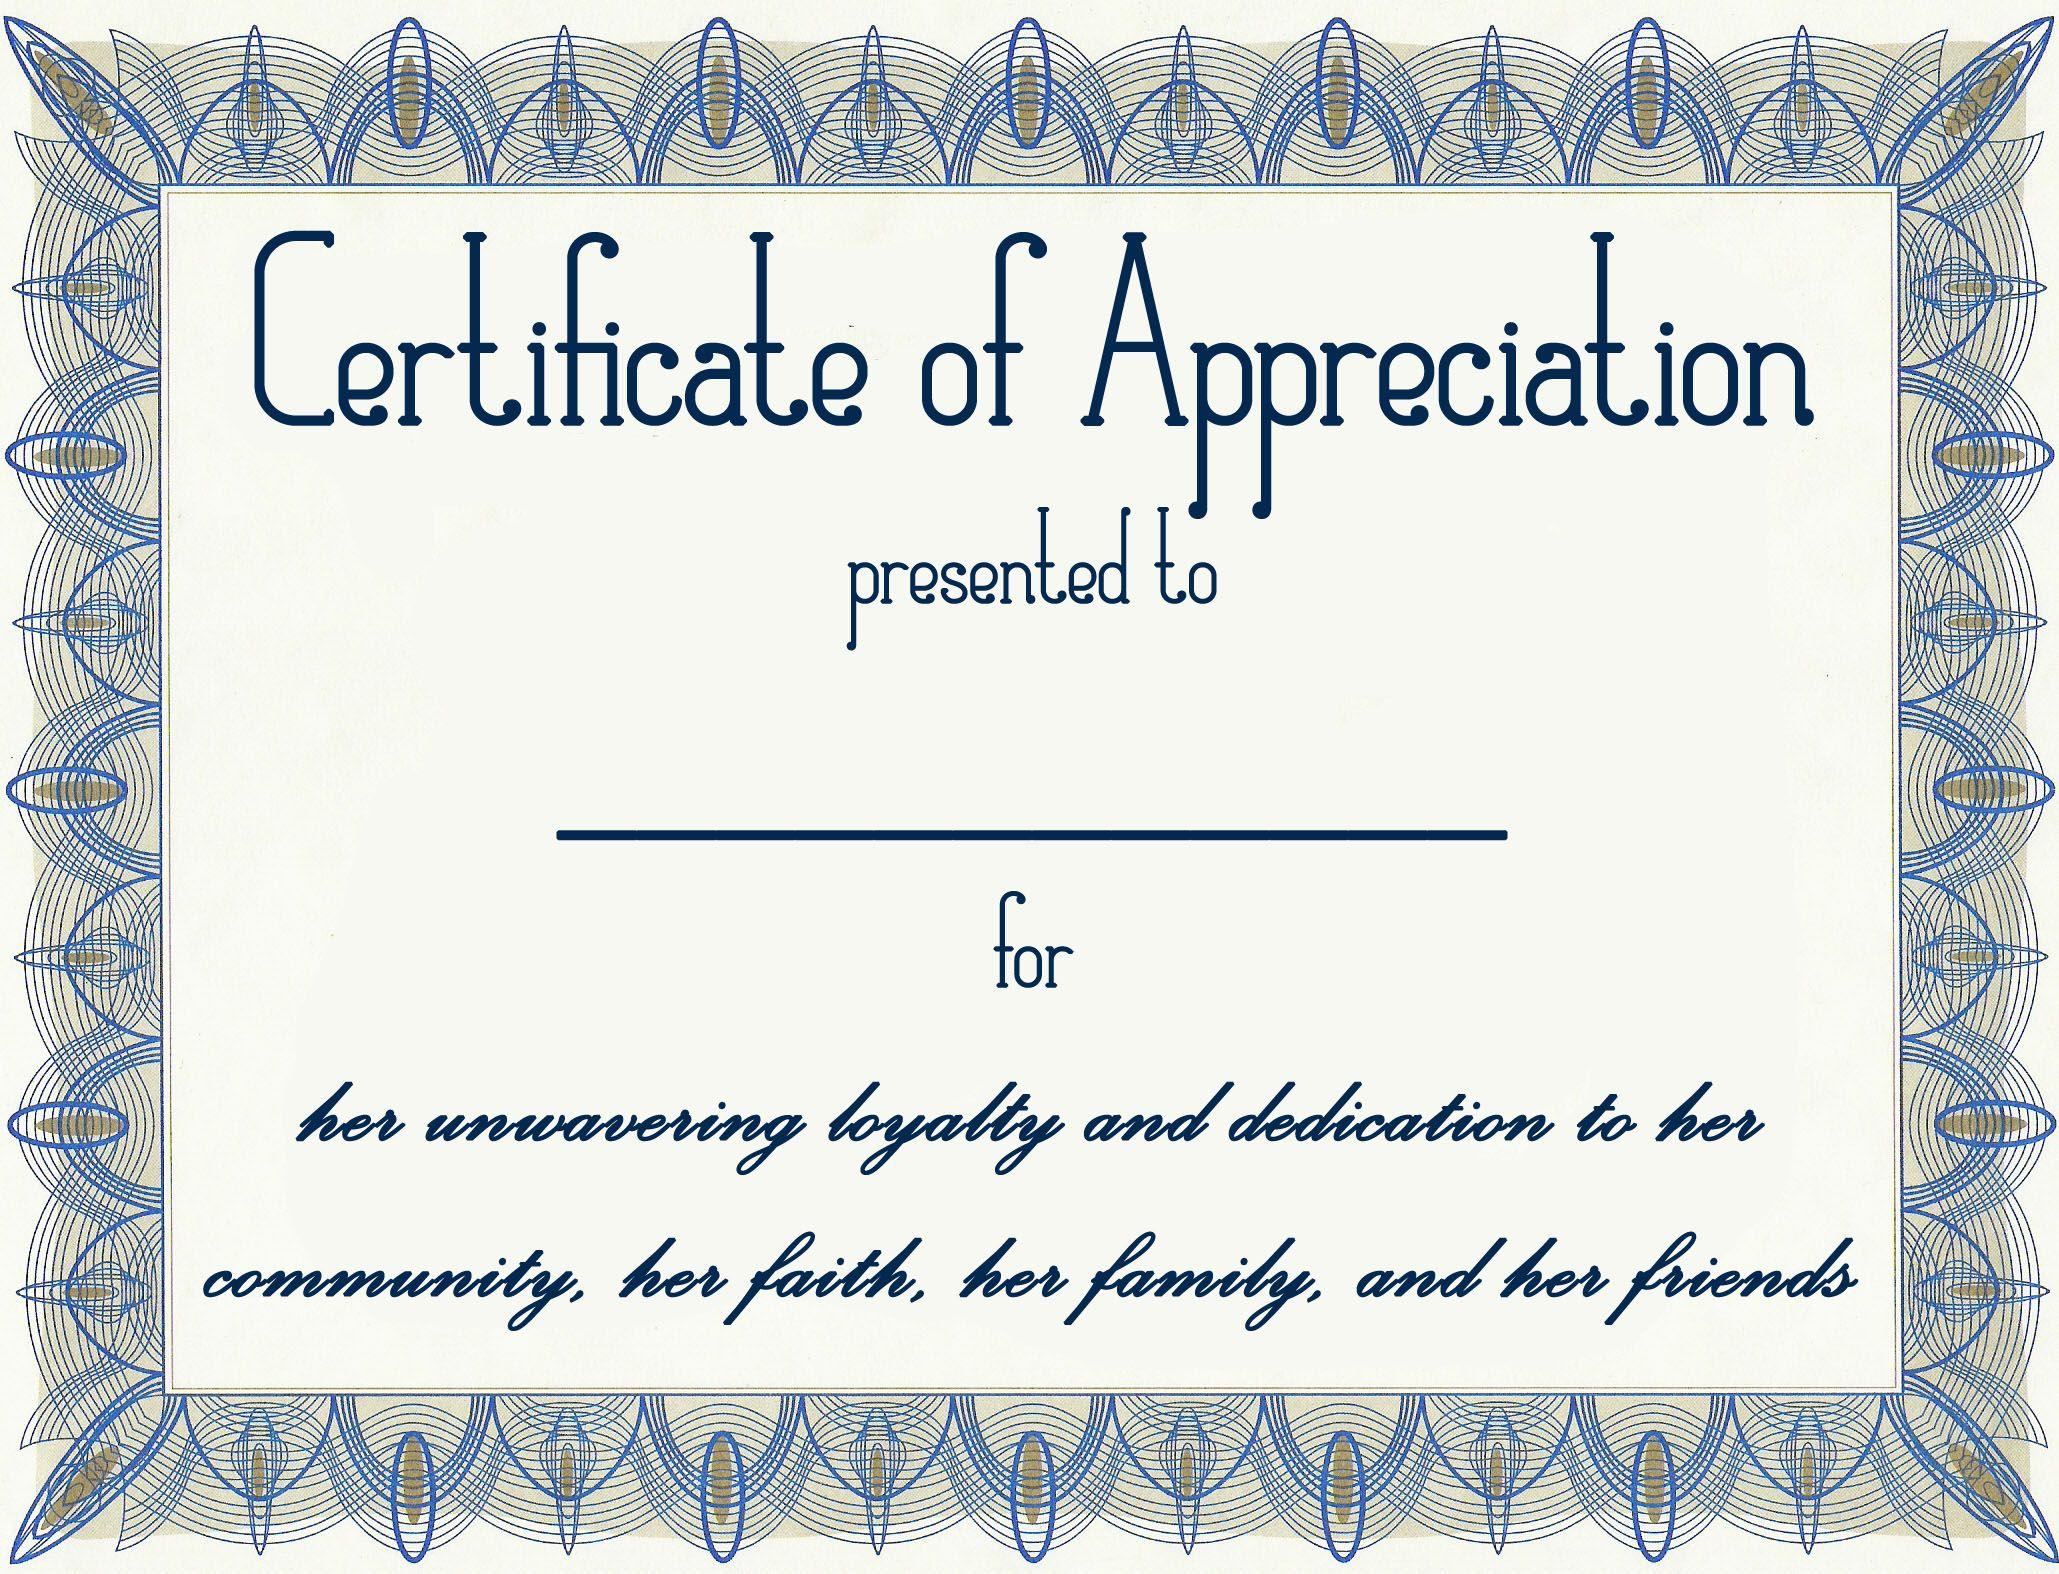 Random act of kindness make someone a certificate of appreciation random act of kindness make someone a certificate of appreciation 1betcityfo Images